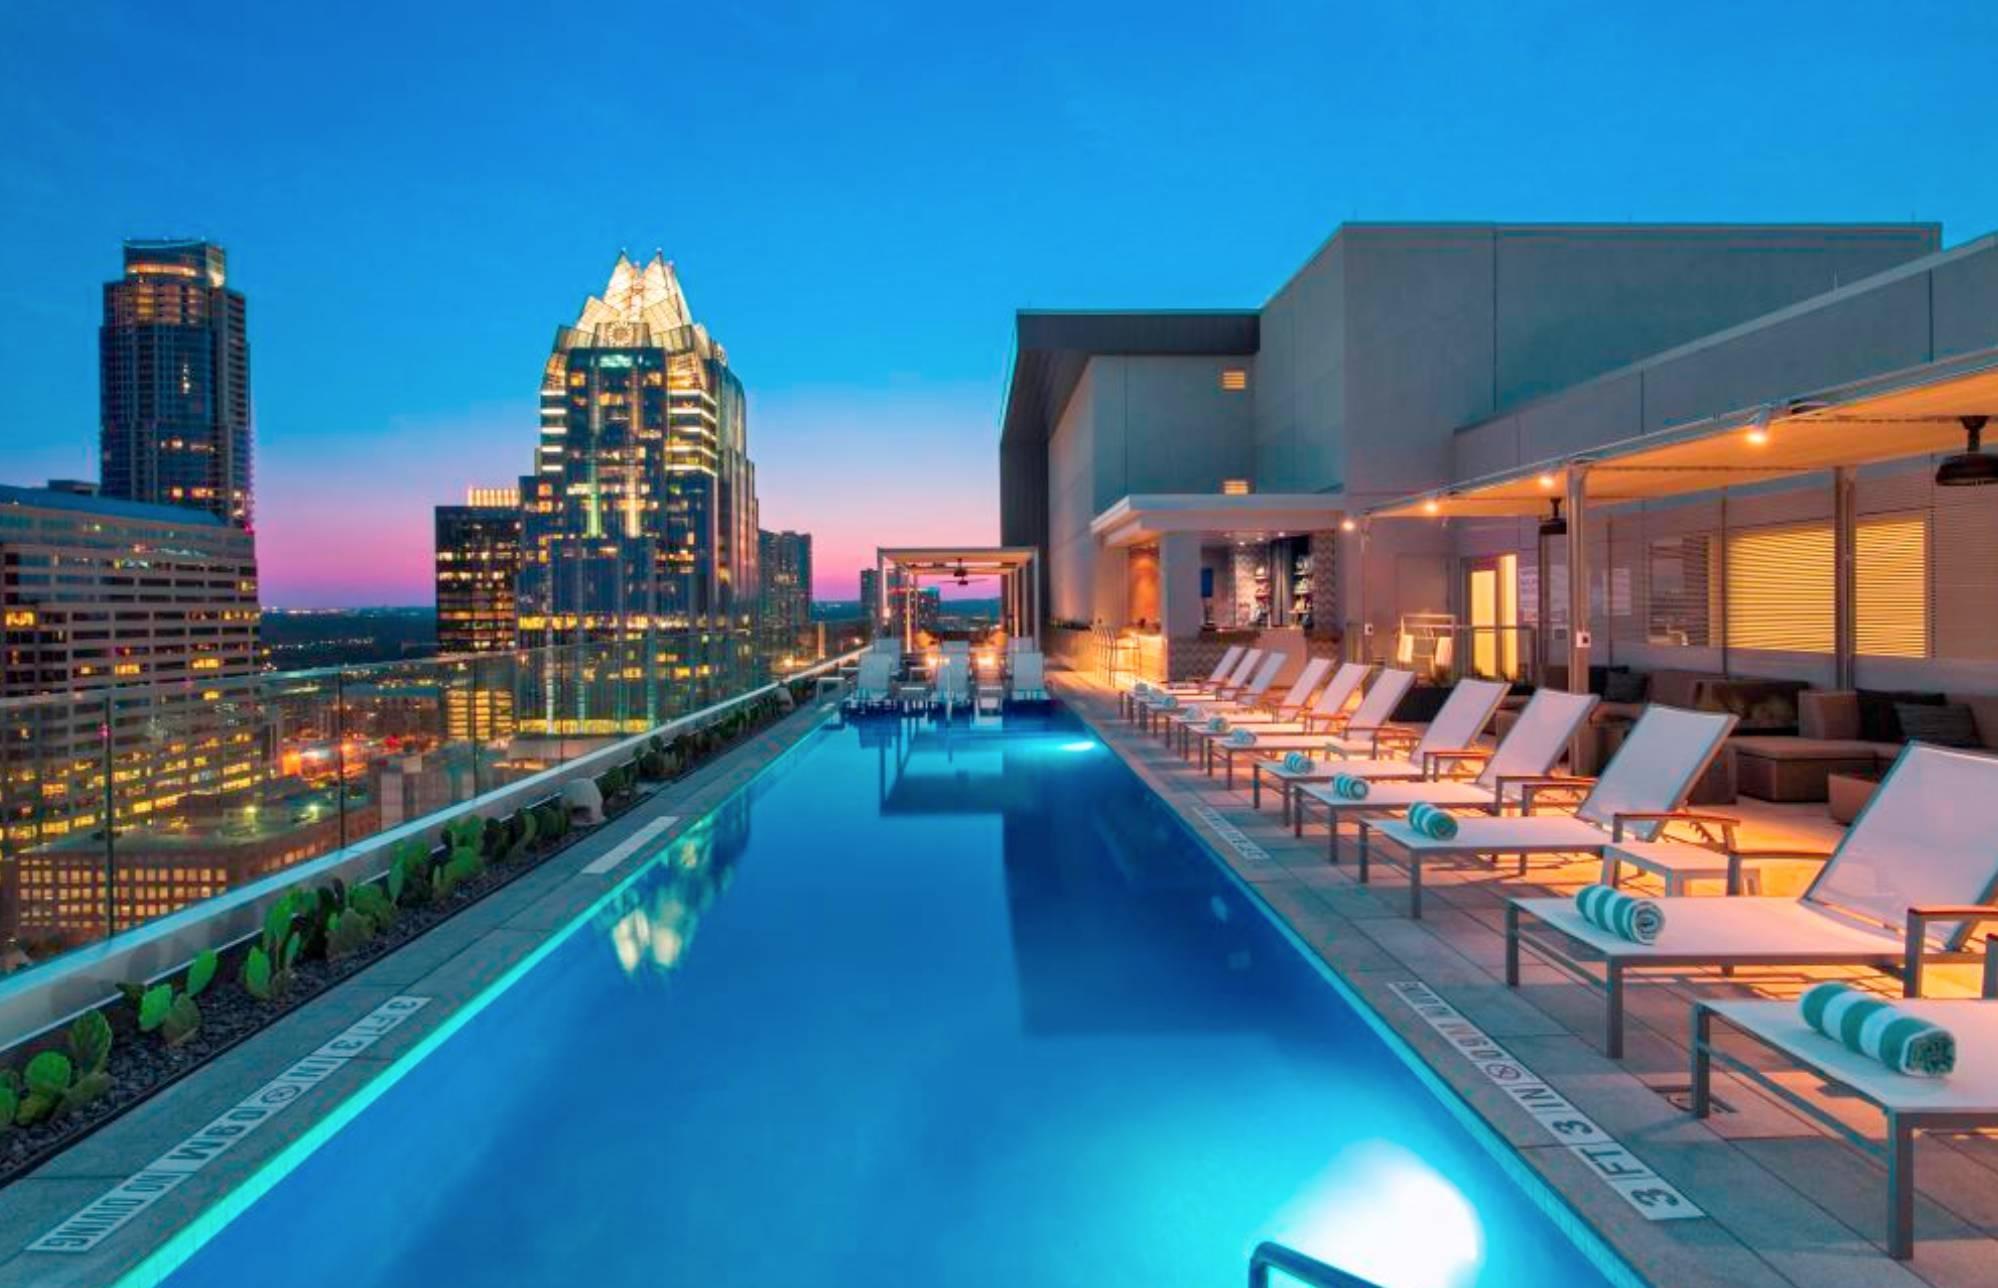 Azul Rooftop Bar + Lounge